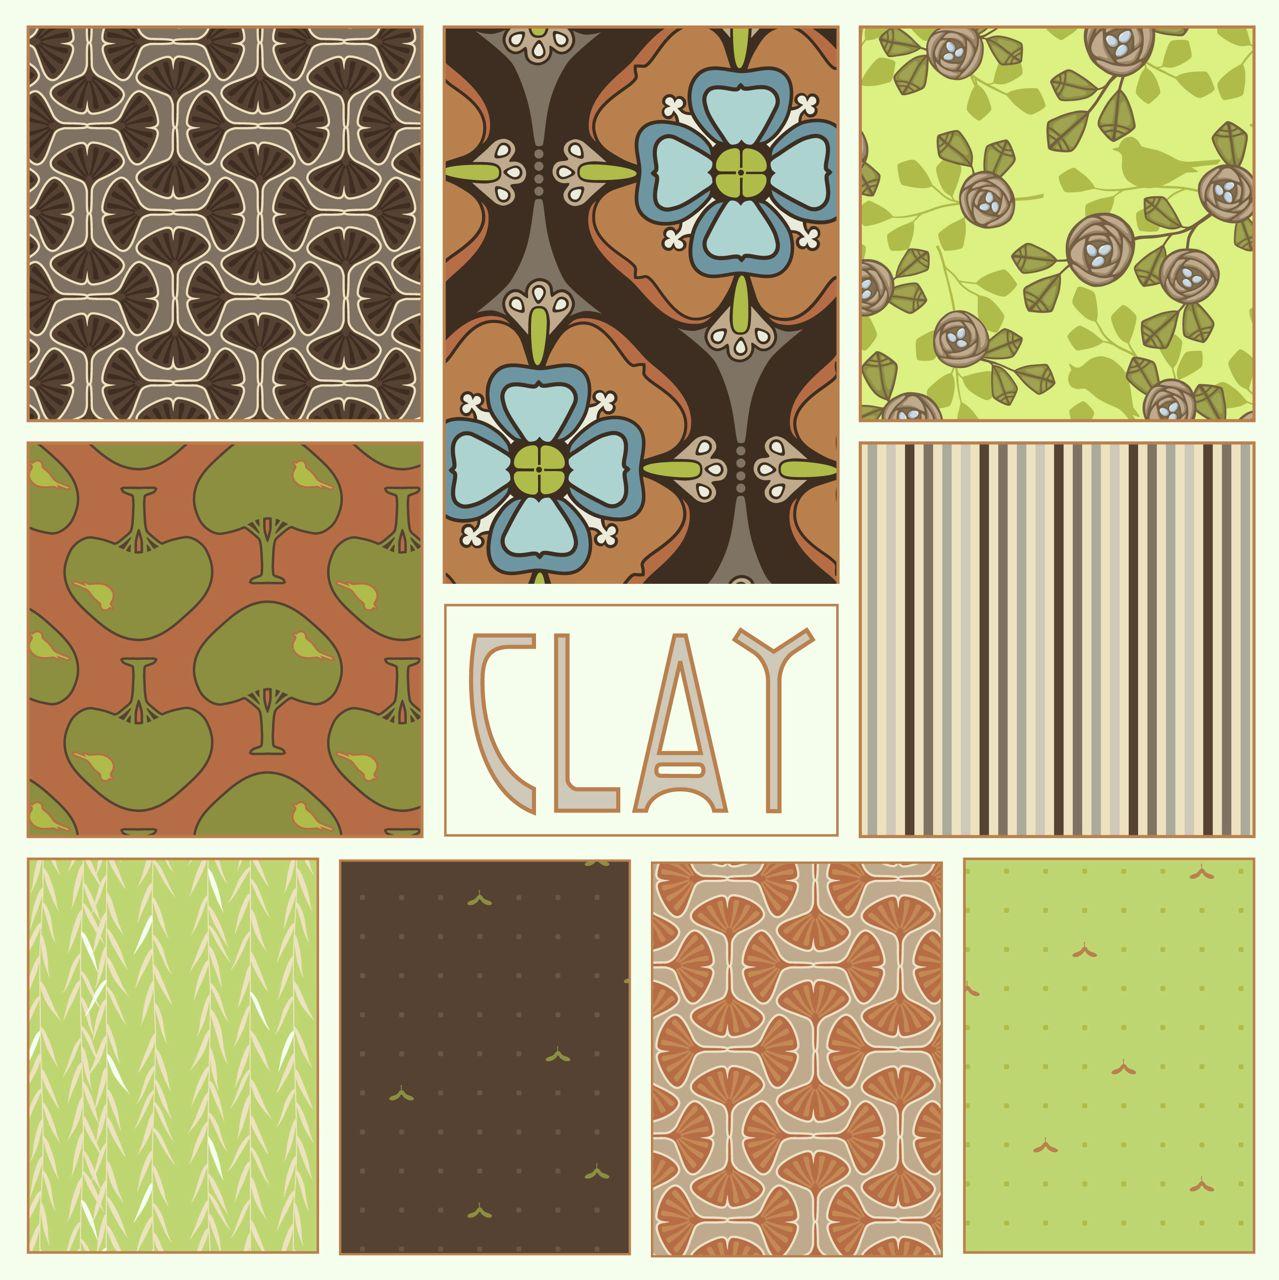 Clay 2